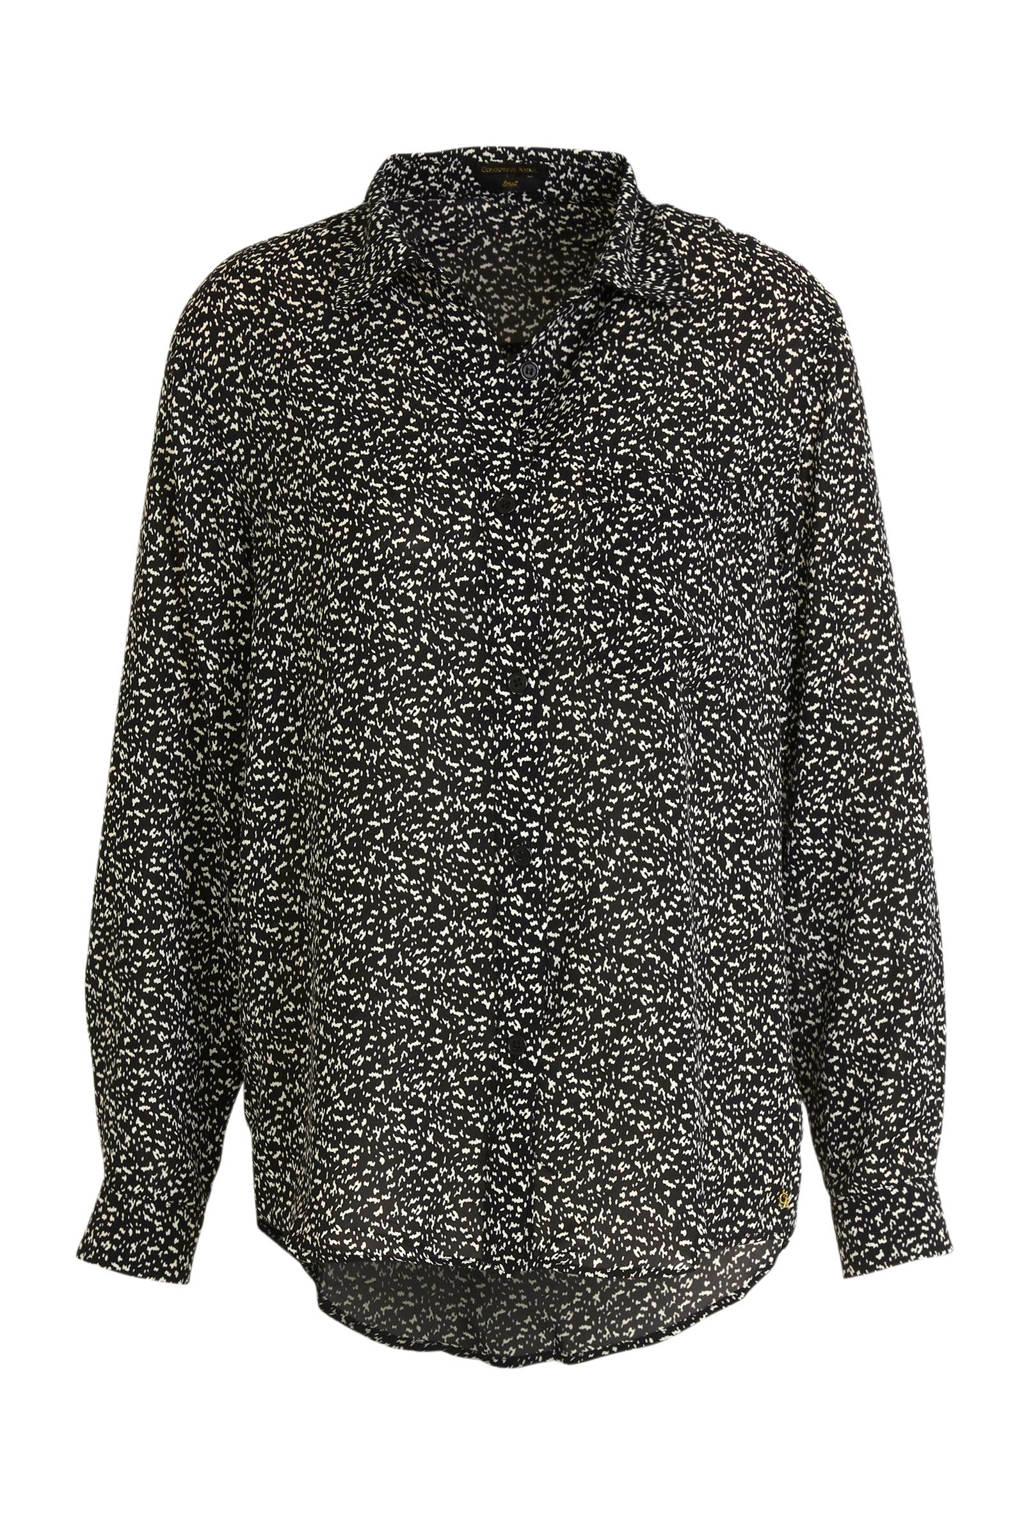 Colourful Rebel blouse Lean met all over print zwart/ wit